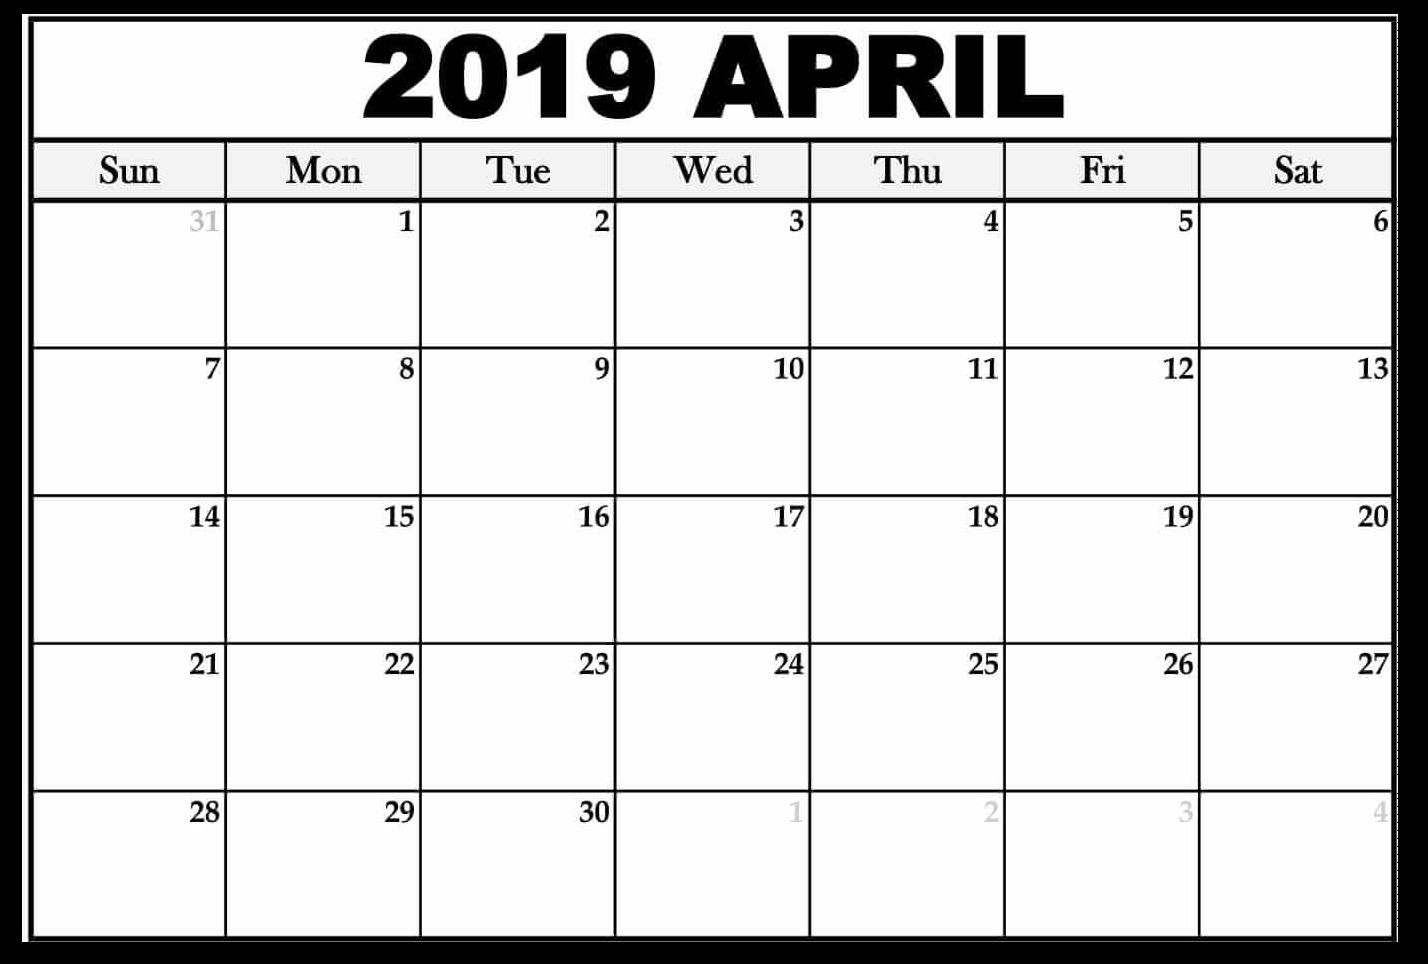 Monthly Calendar Template April 2019